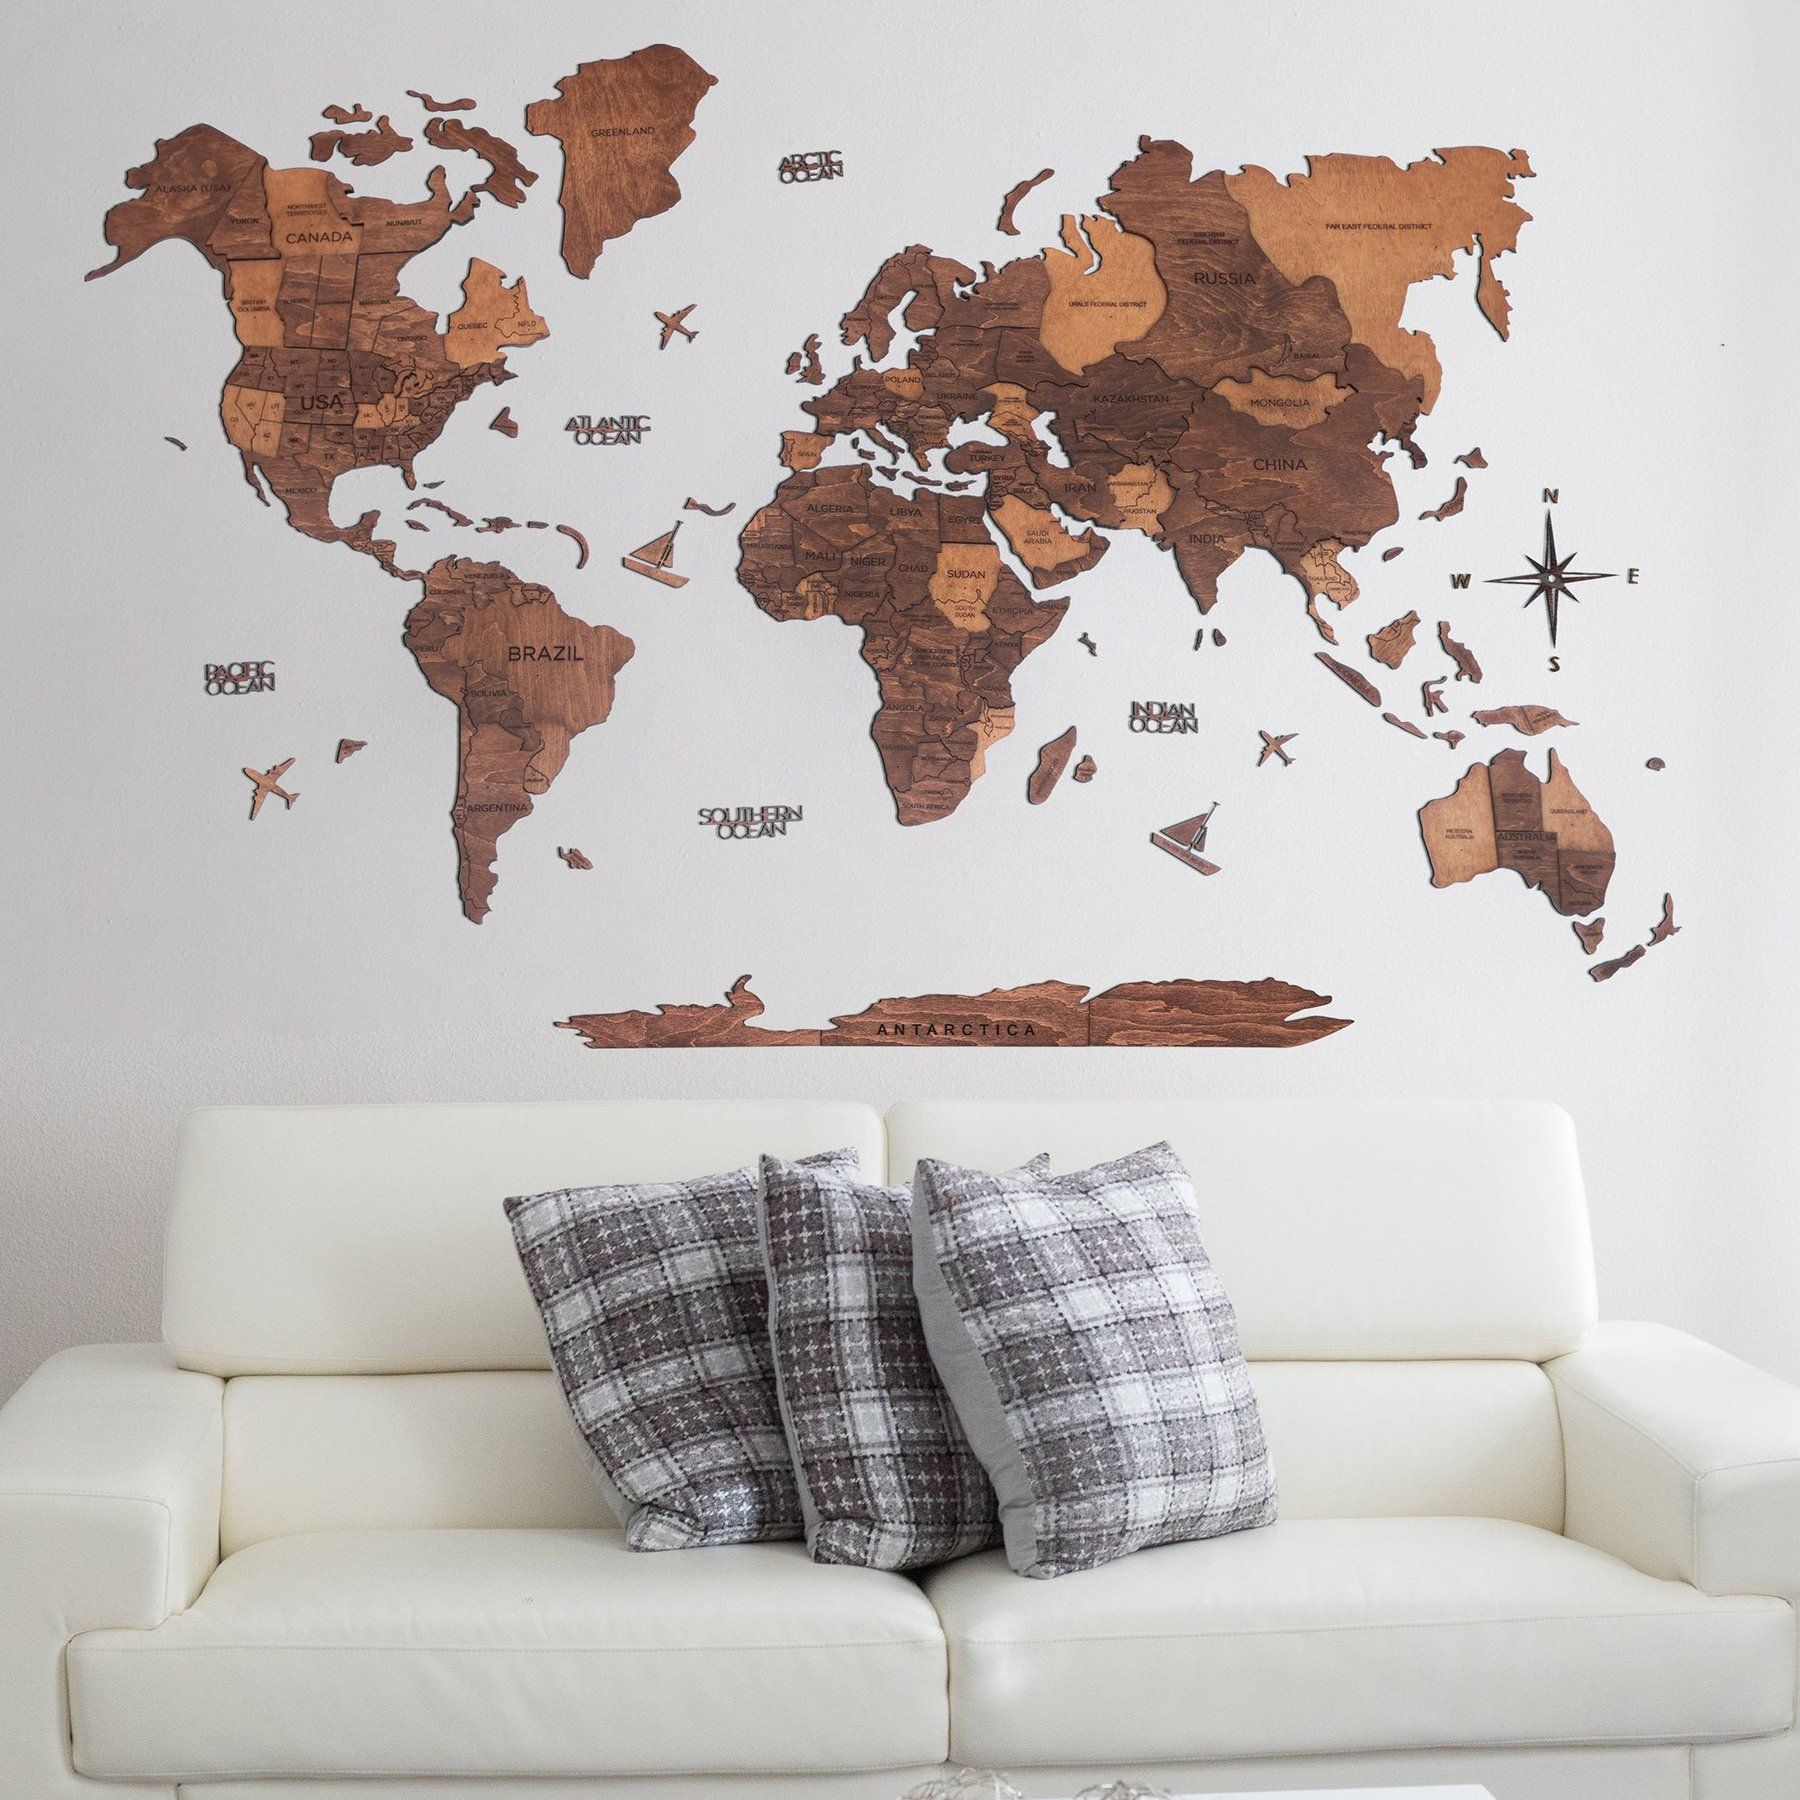 enjoy the wood world map